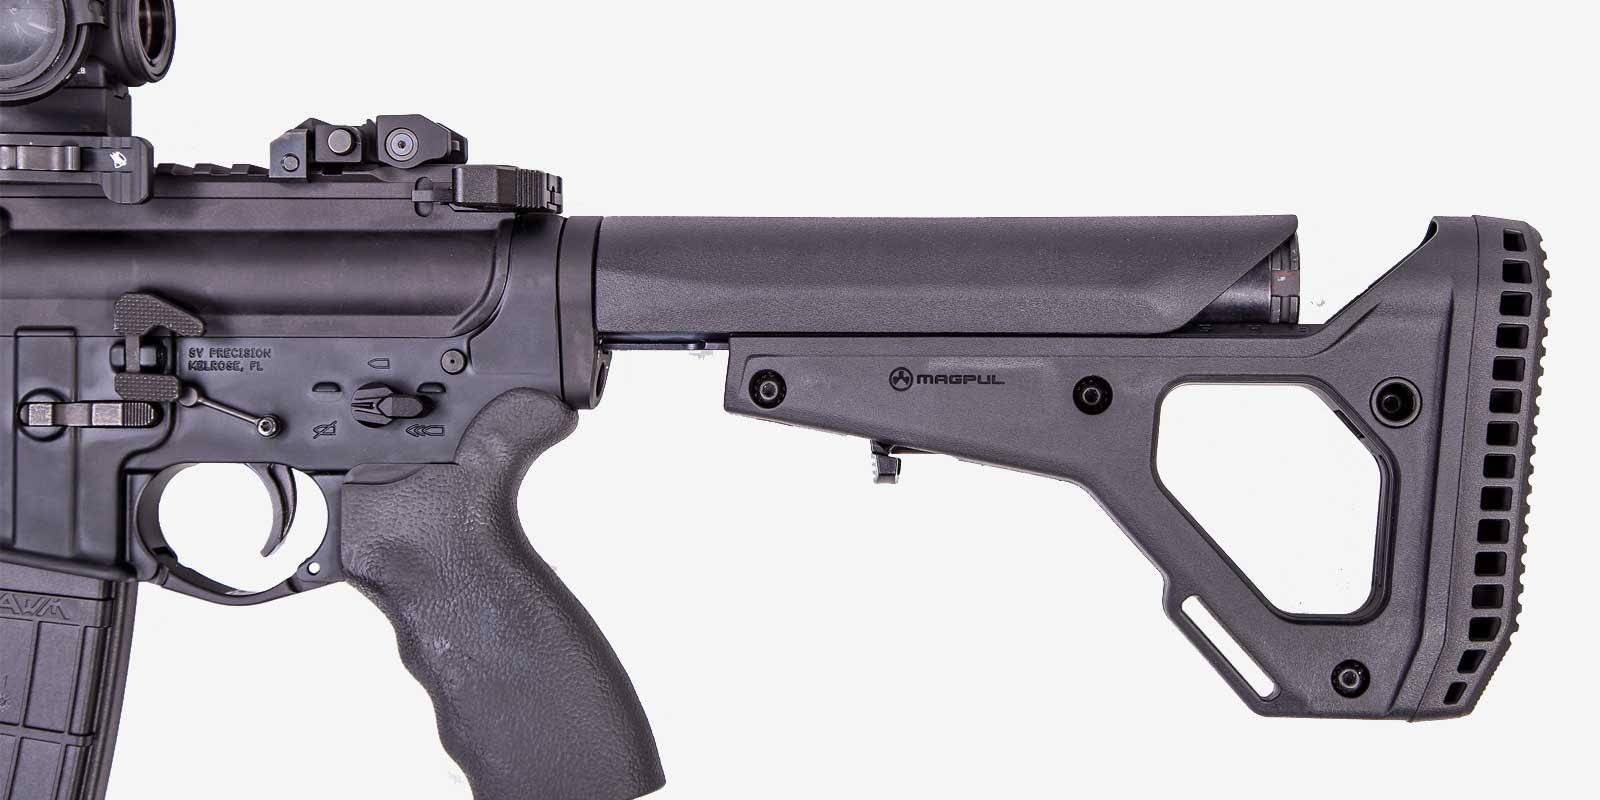 ar rifle butt stock